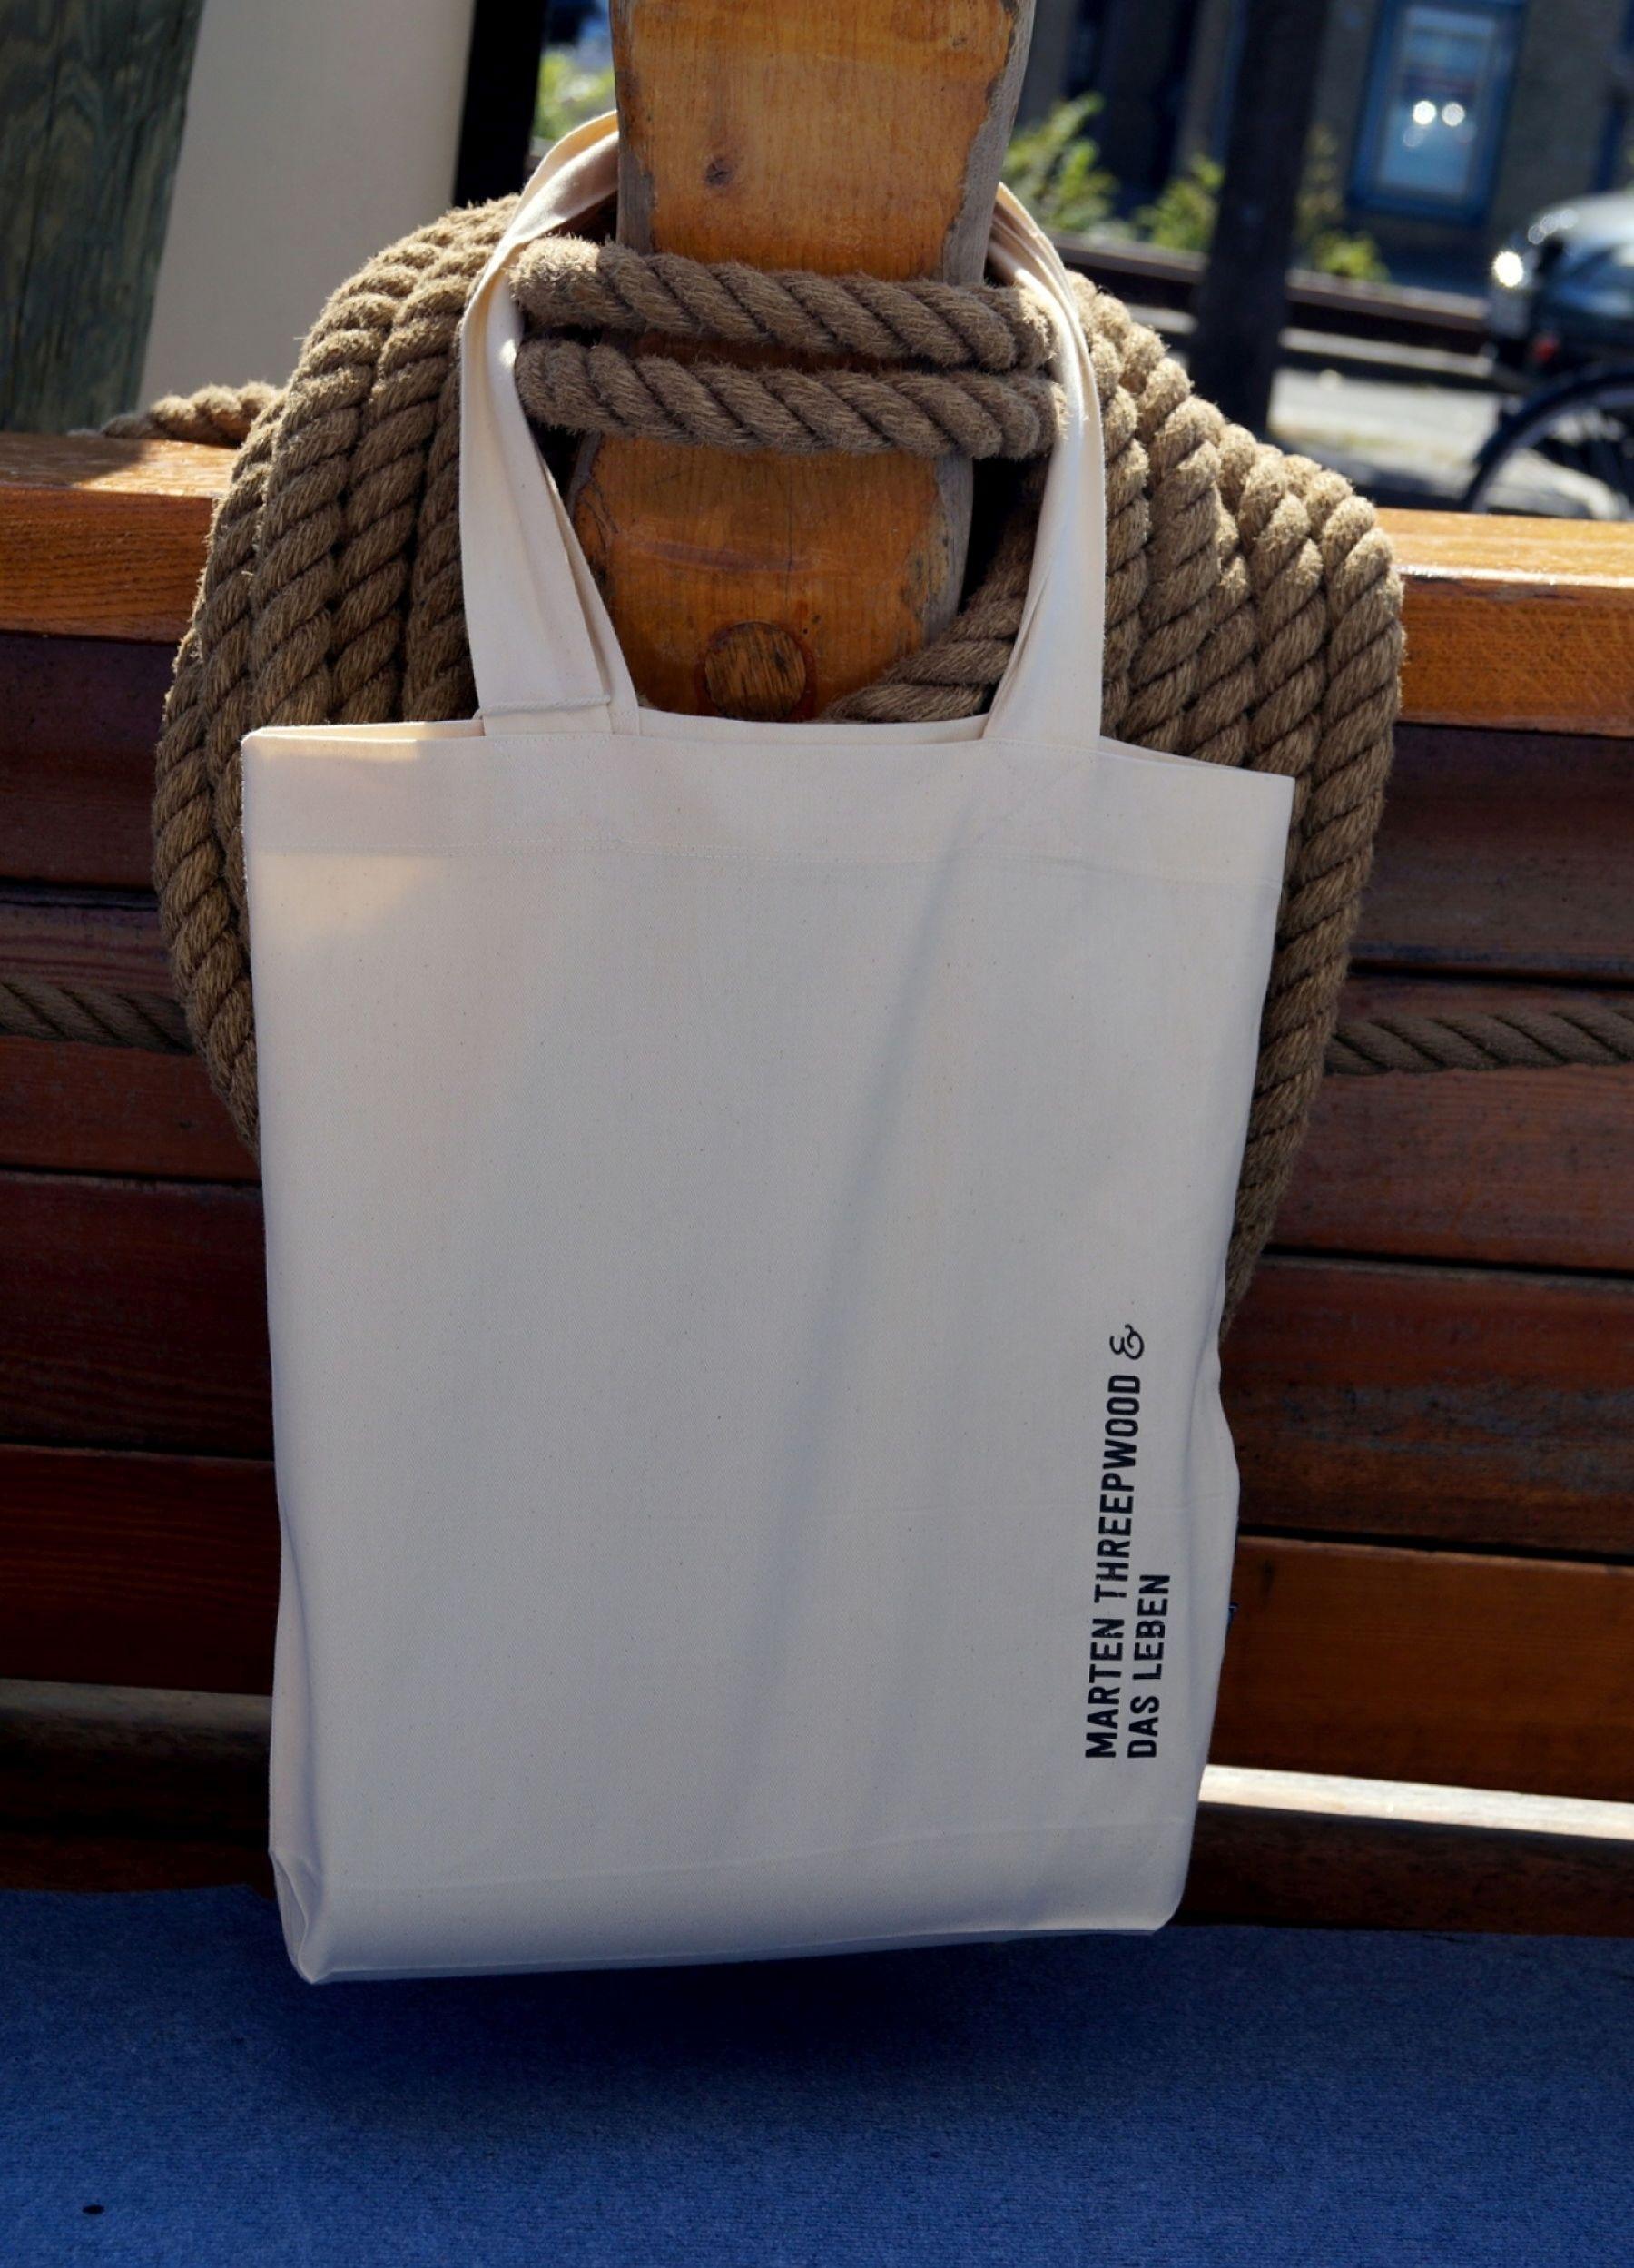 Marten Threepwood & Das Leben - Merchandise